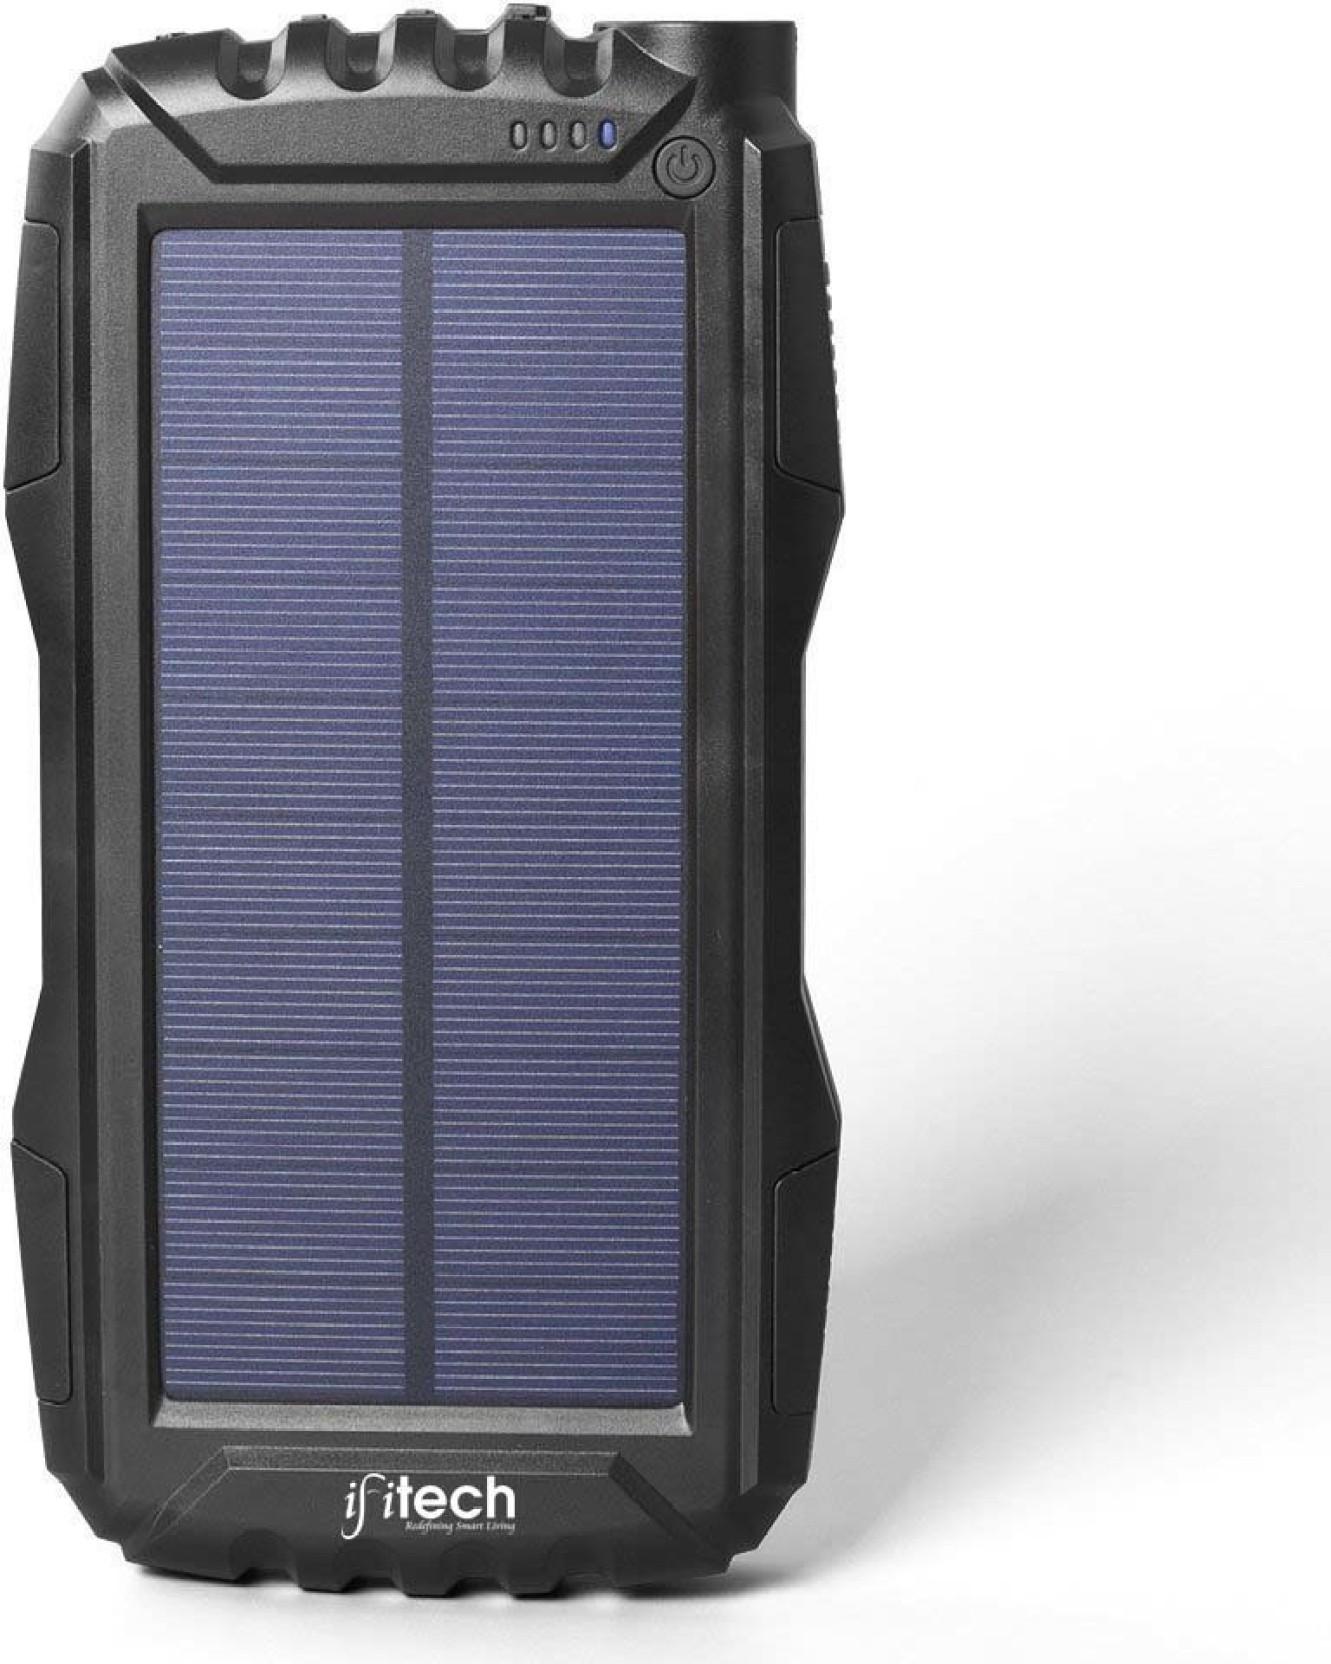 Ifitech 20000 Mah Power Bank Scpb15 20000mah Solar For M Plus M5 Battery Pack 5000 Black Home